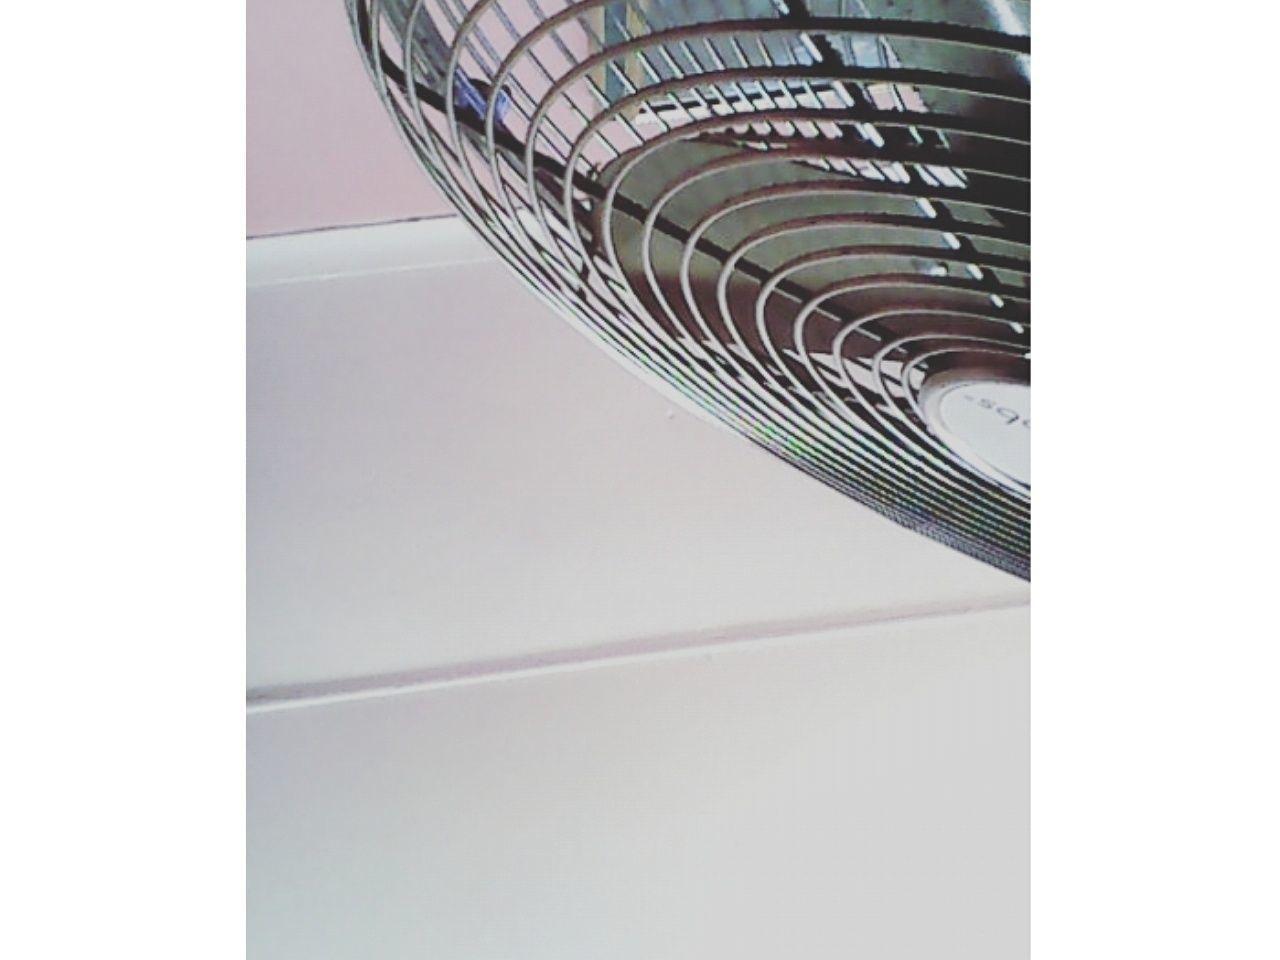 Wires Urbanlife Urbanbutmodern